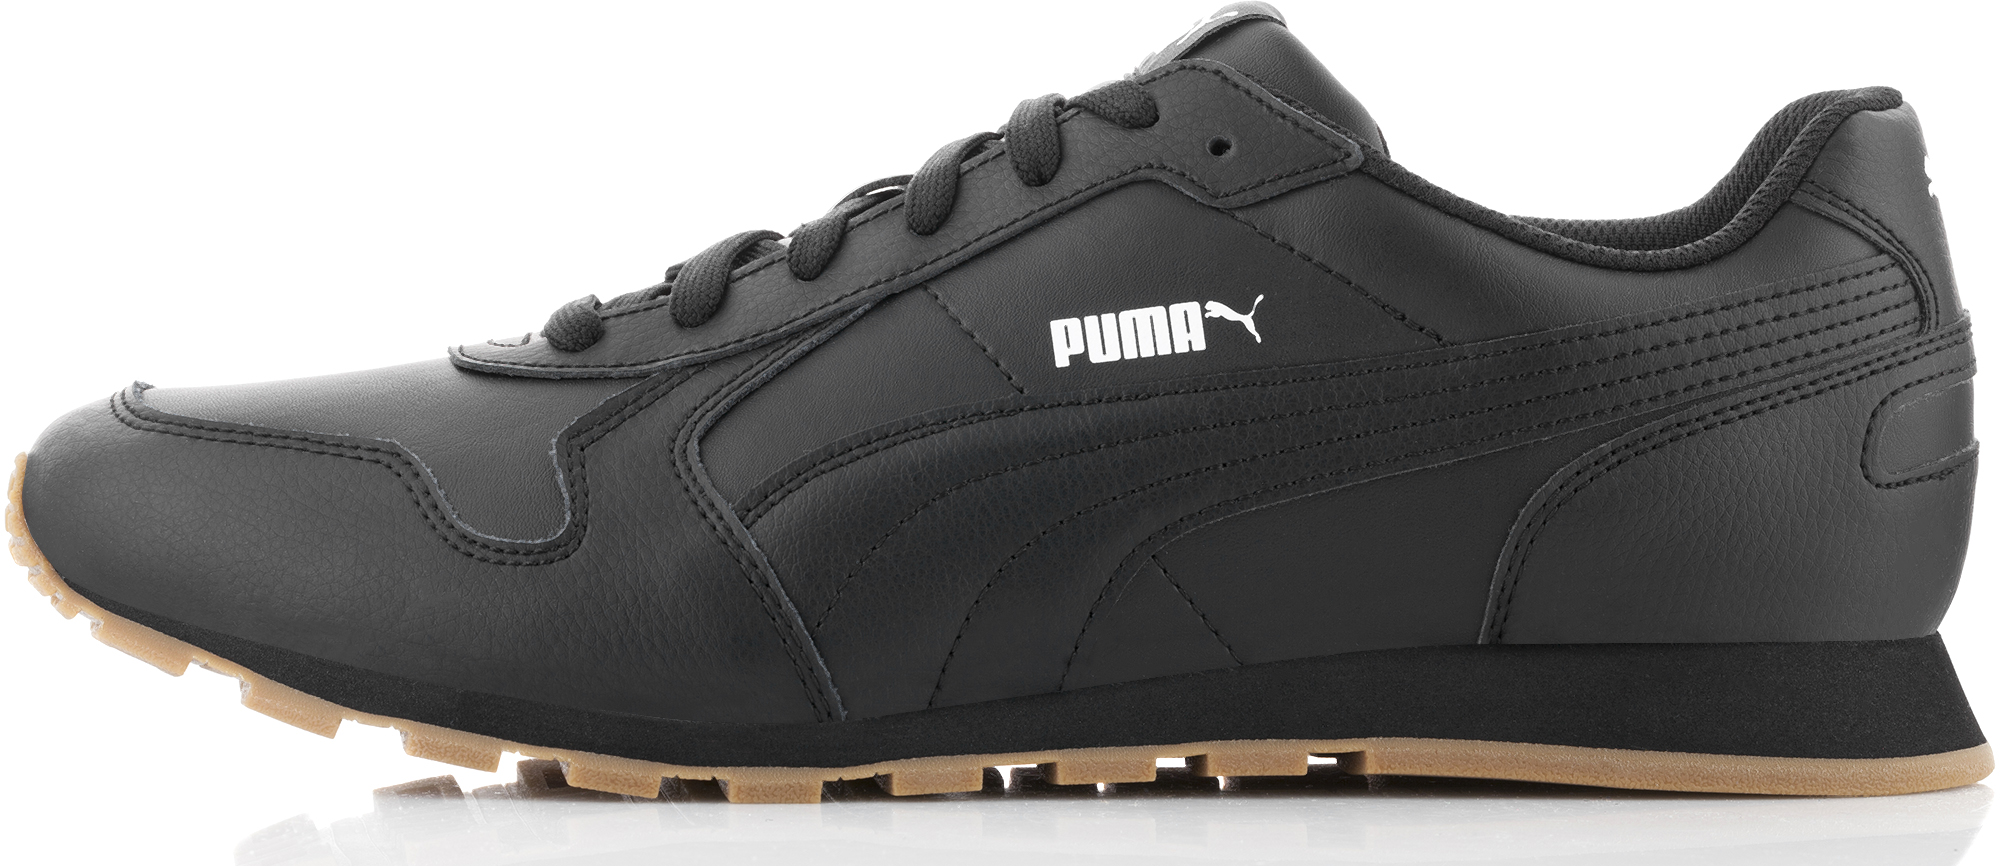 Puma Кроссовки мужские Puma ST Runner Full кроссовки puma кроссовки